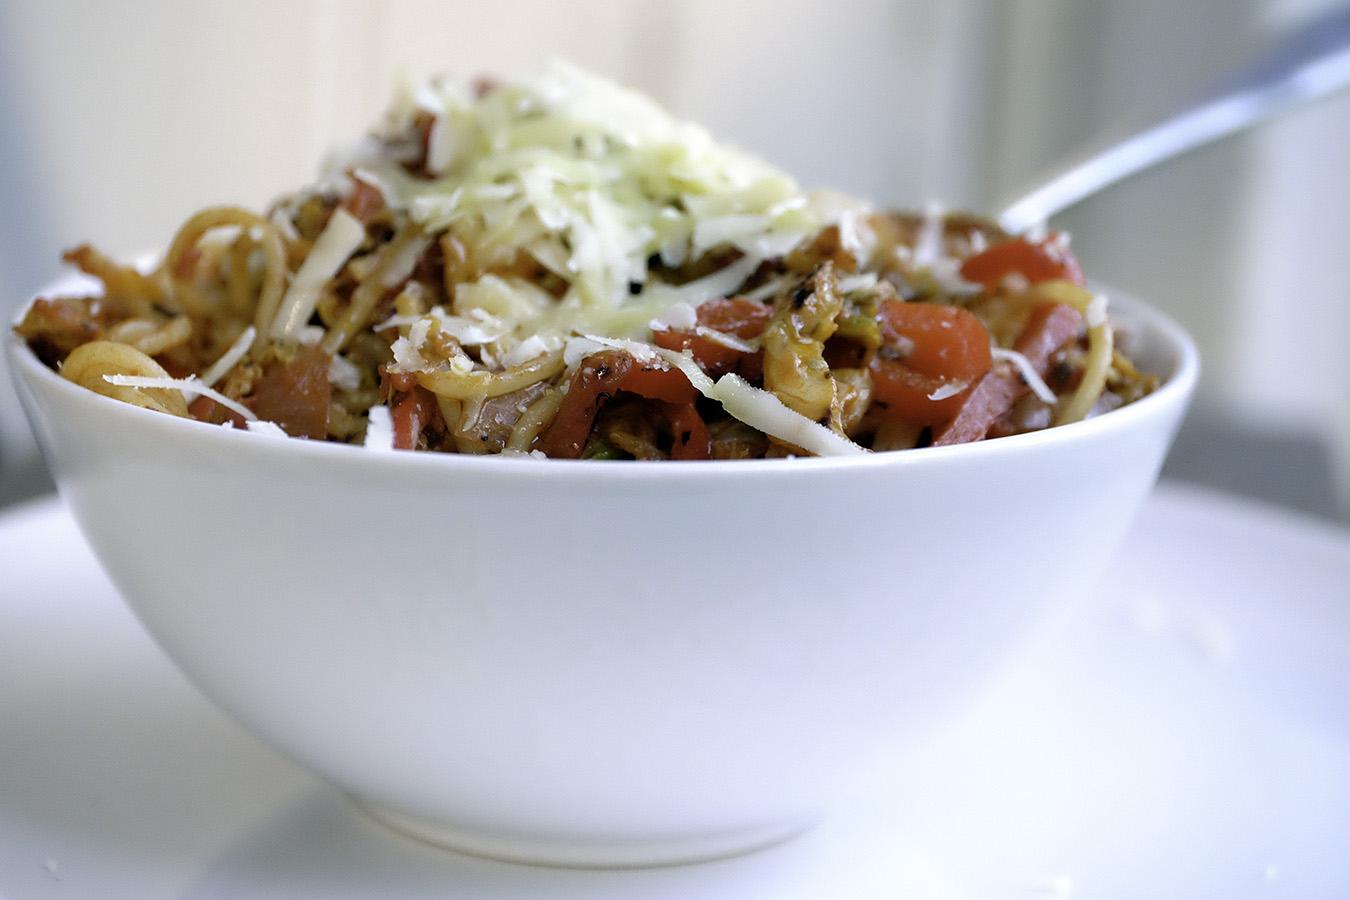 photo: London food photographers, Margaret Yescombe, vegetarian, pasta, meal, image, photos, photography